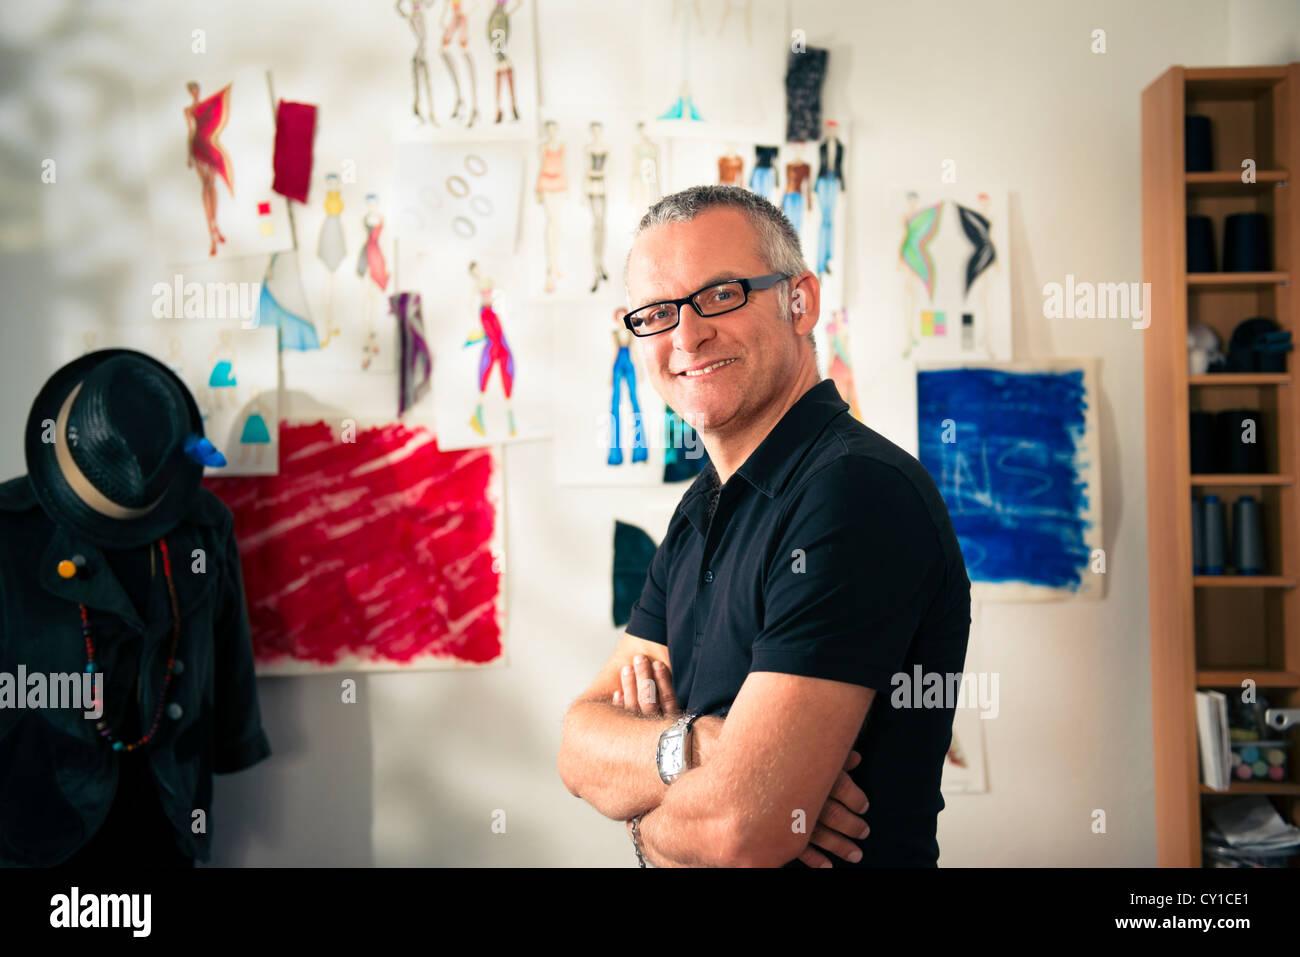 Confident entrepreneur, portrait of happy mature man working as fashion designer and dressmaker in atelier - Stock Image